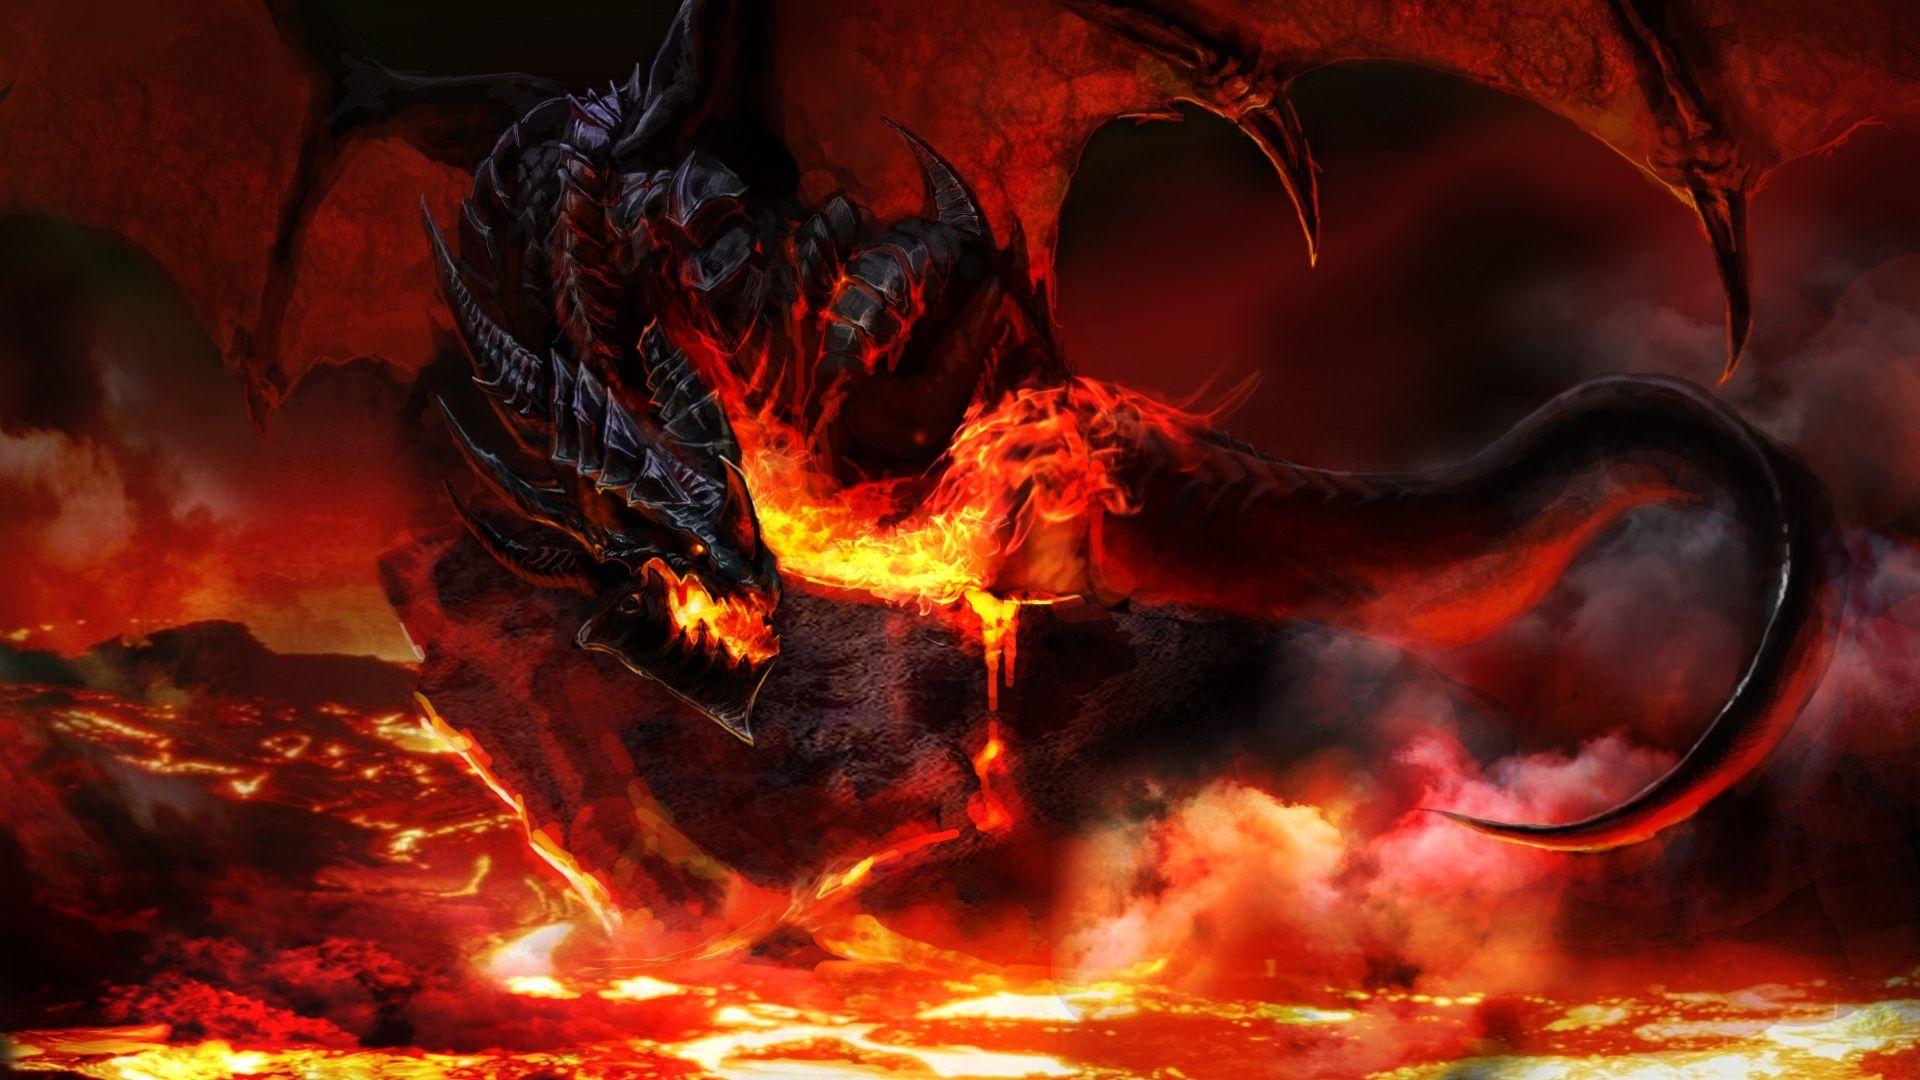 Hd wallpaper dragon - 1080p Dragon Wallpaper Wallpapersafari